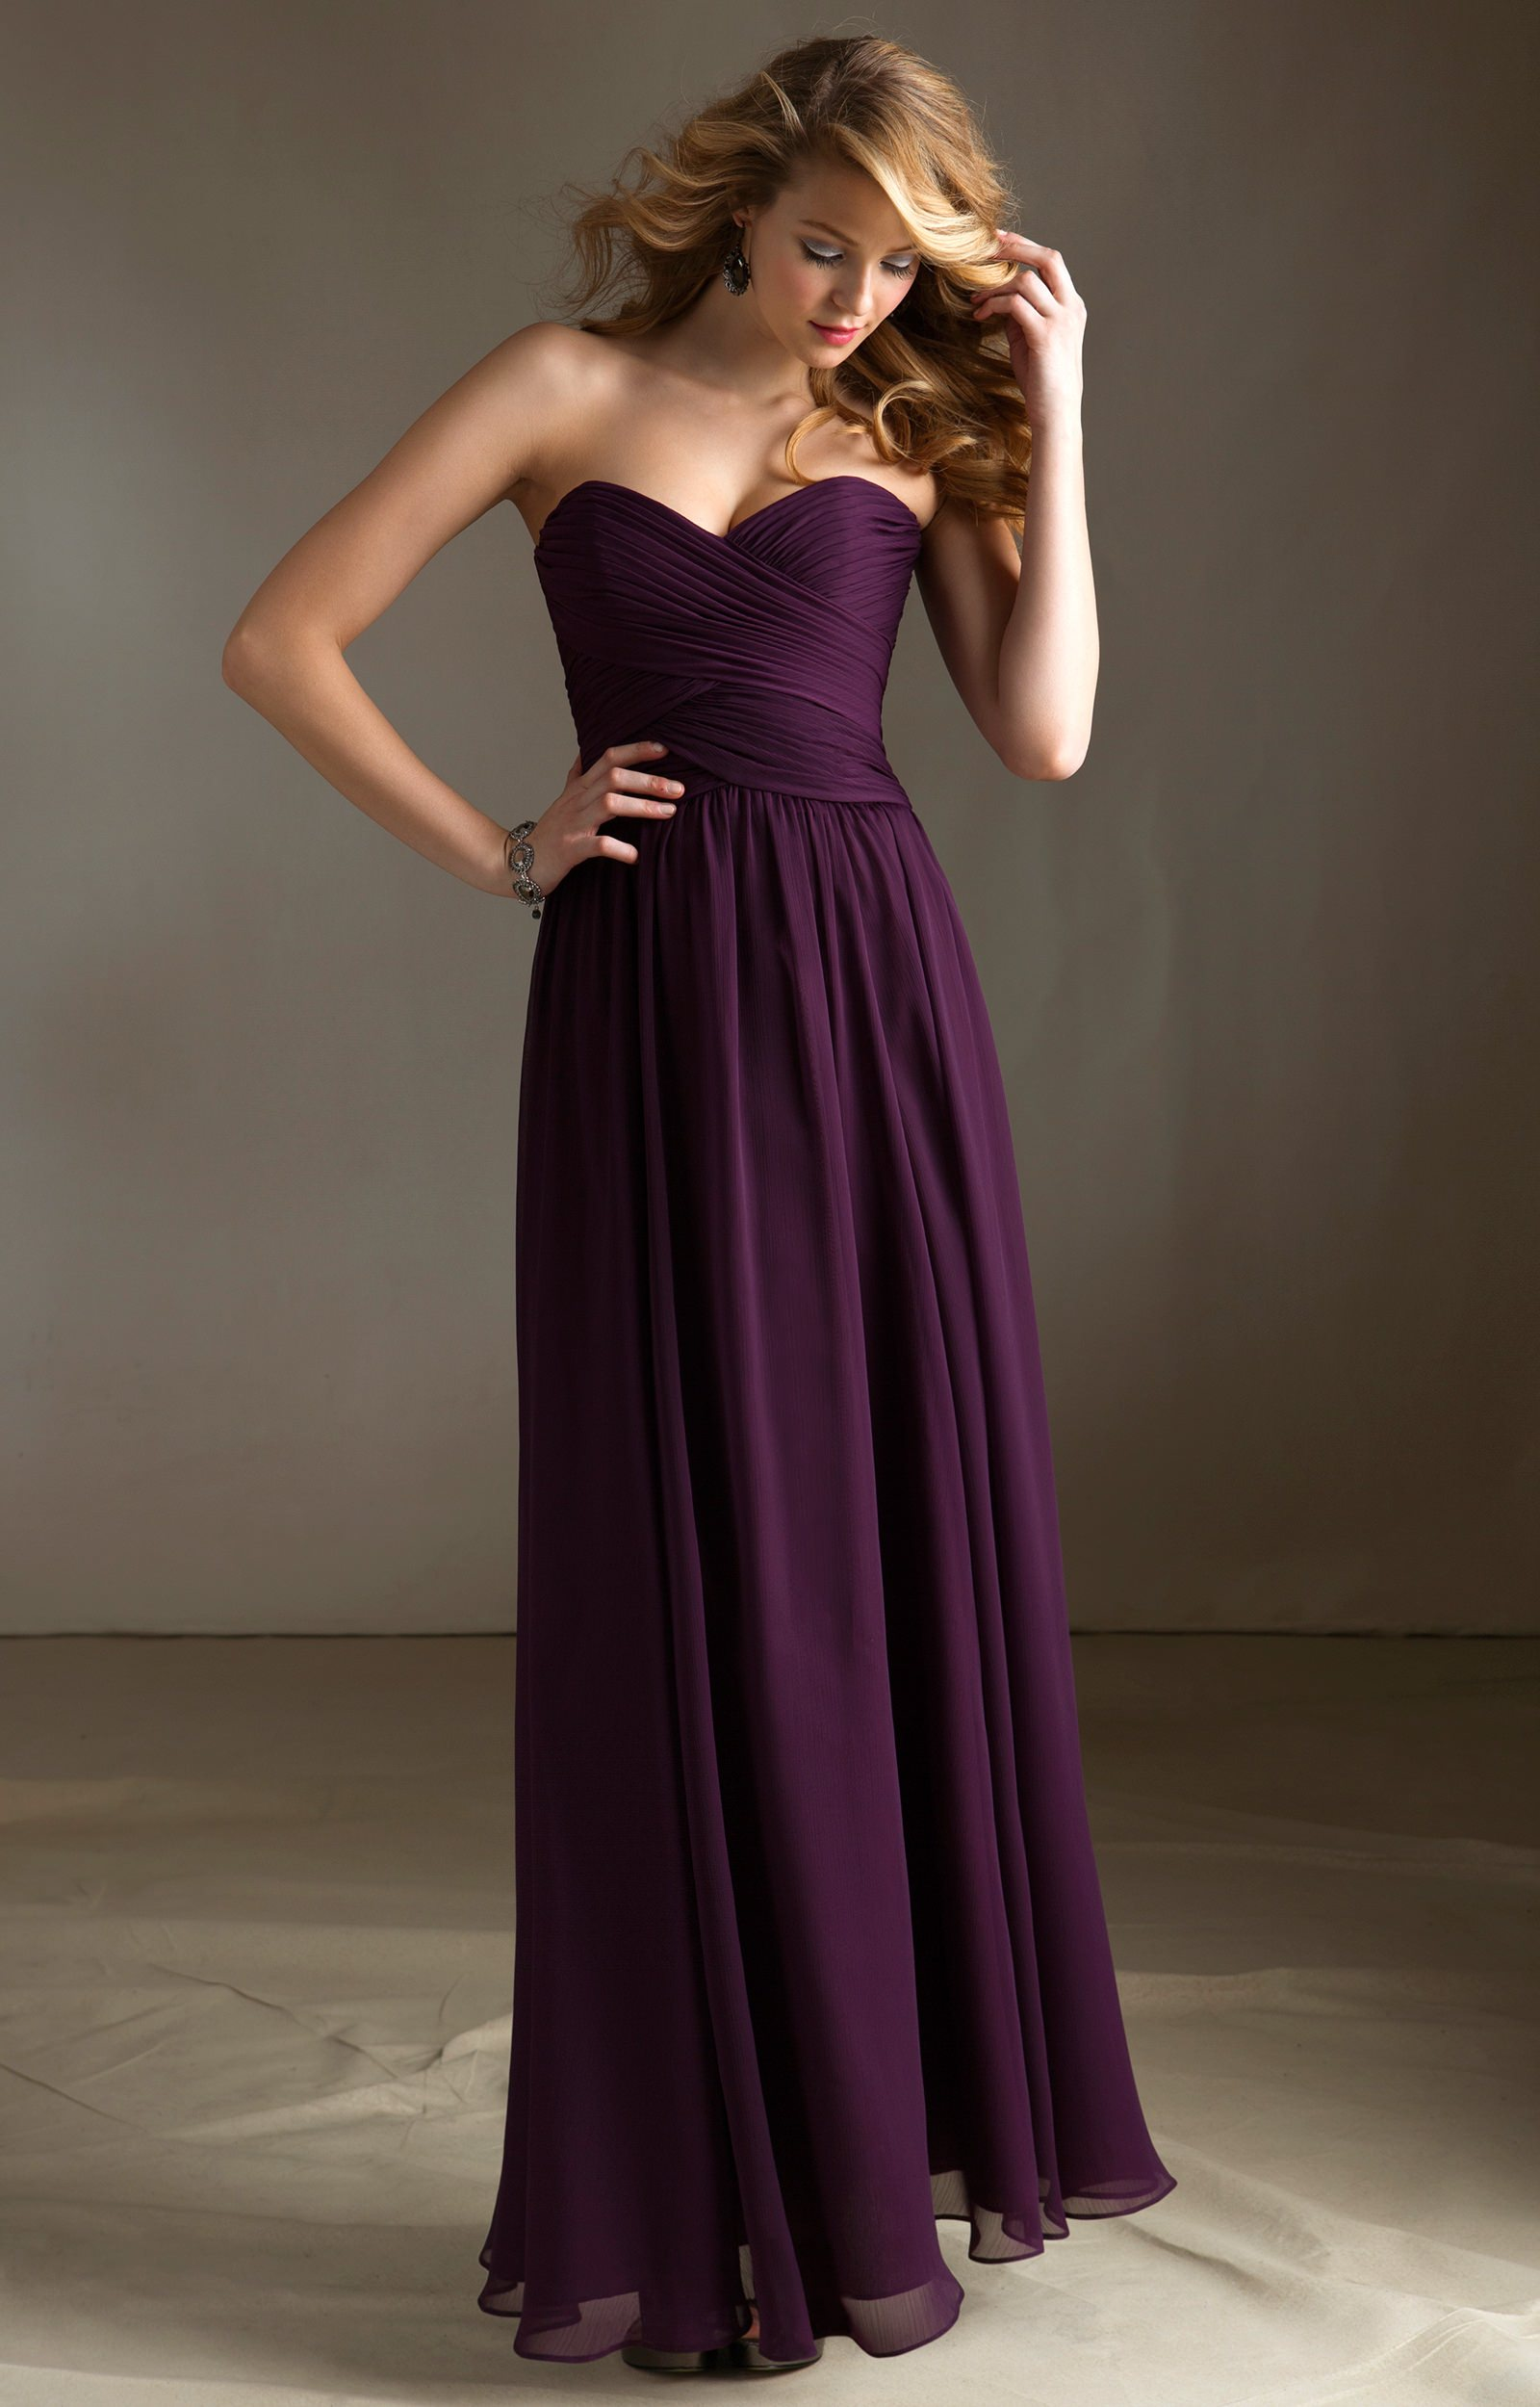 Angelina Faccenda 2015 Bridesmaid Dress